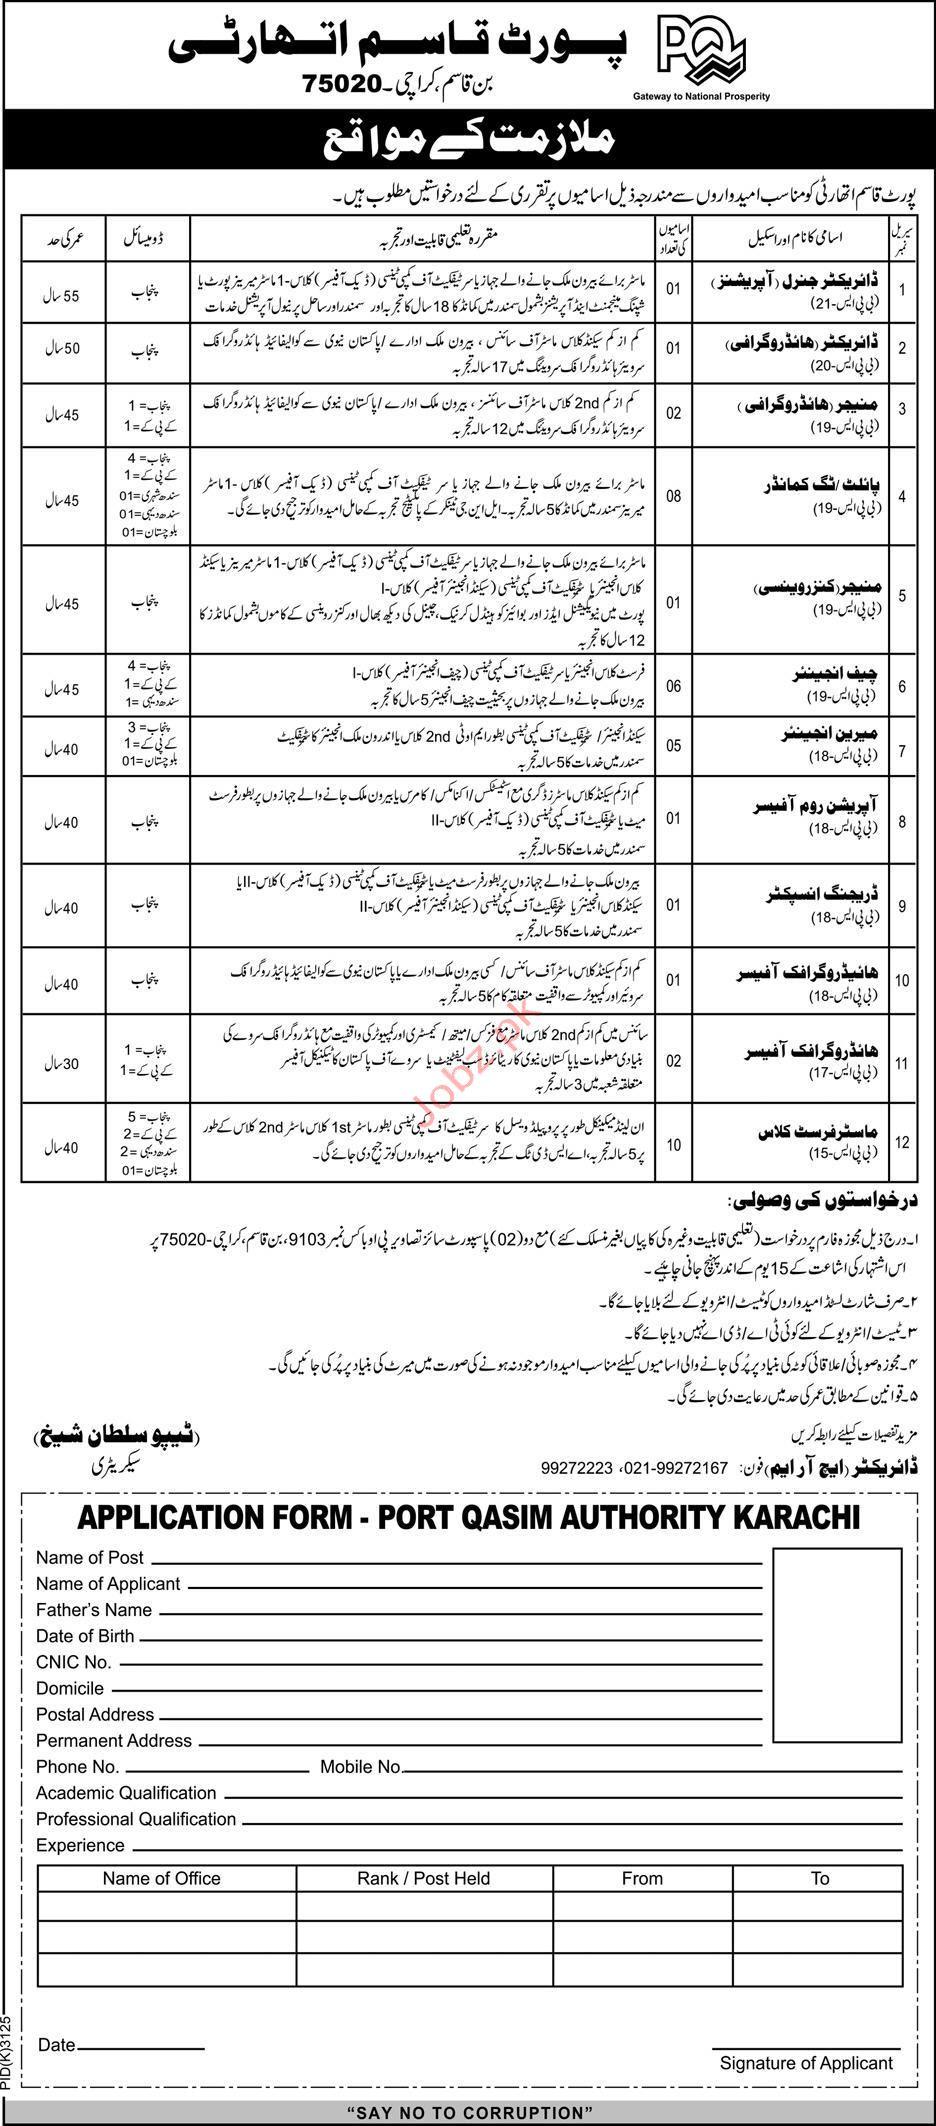 Port Qasim Authority Management Jobs 2019